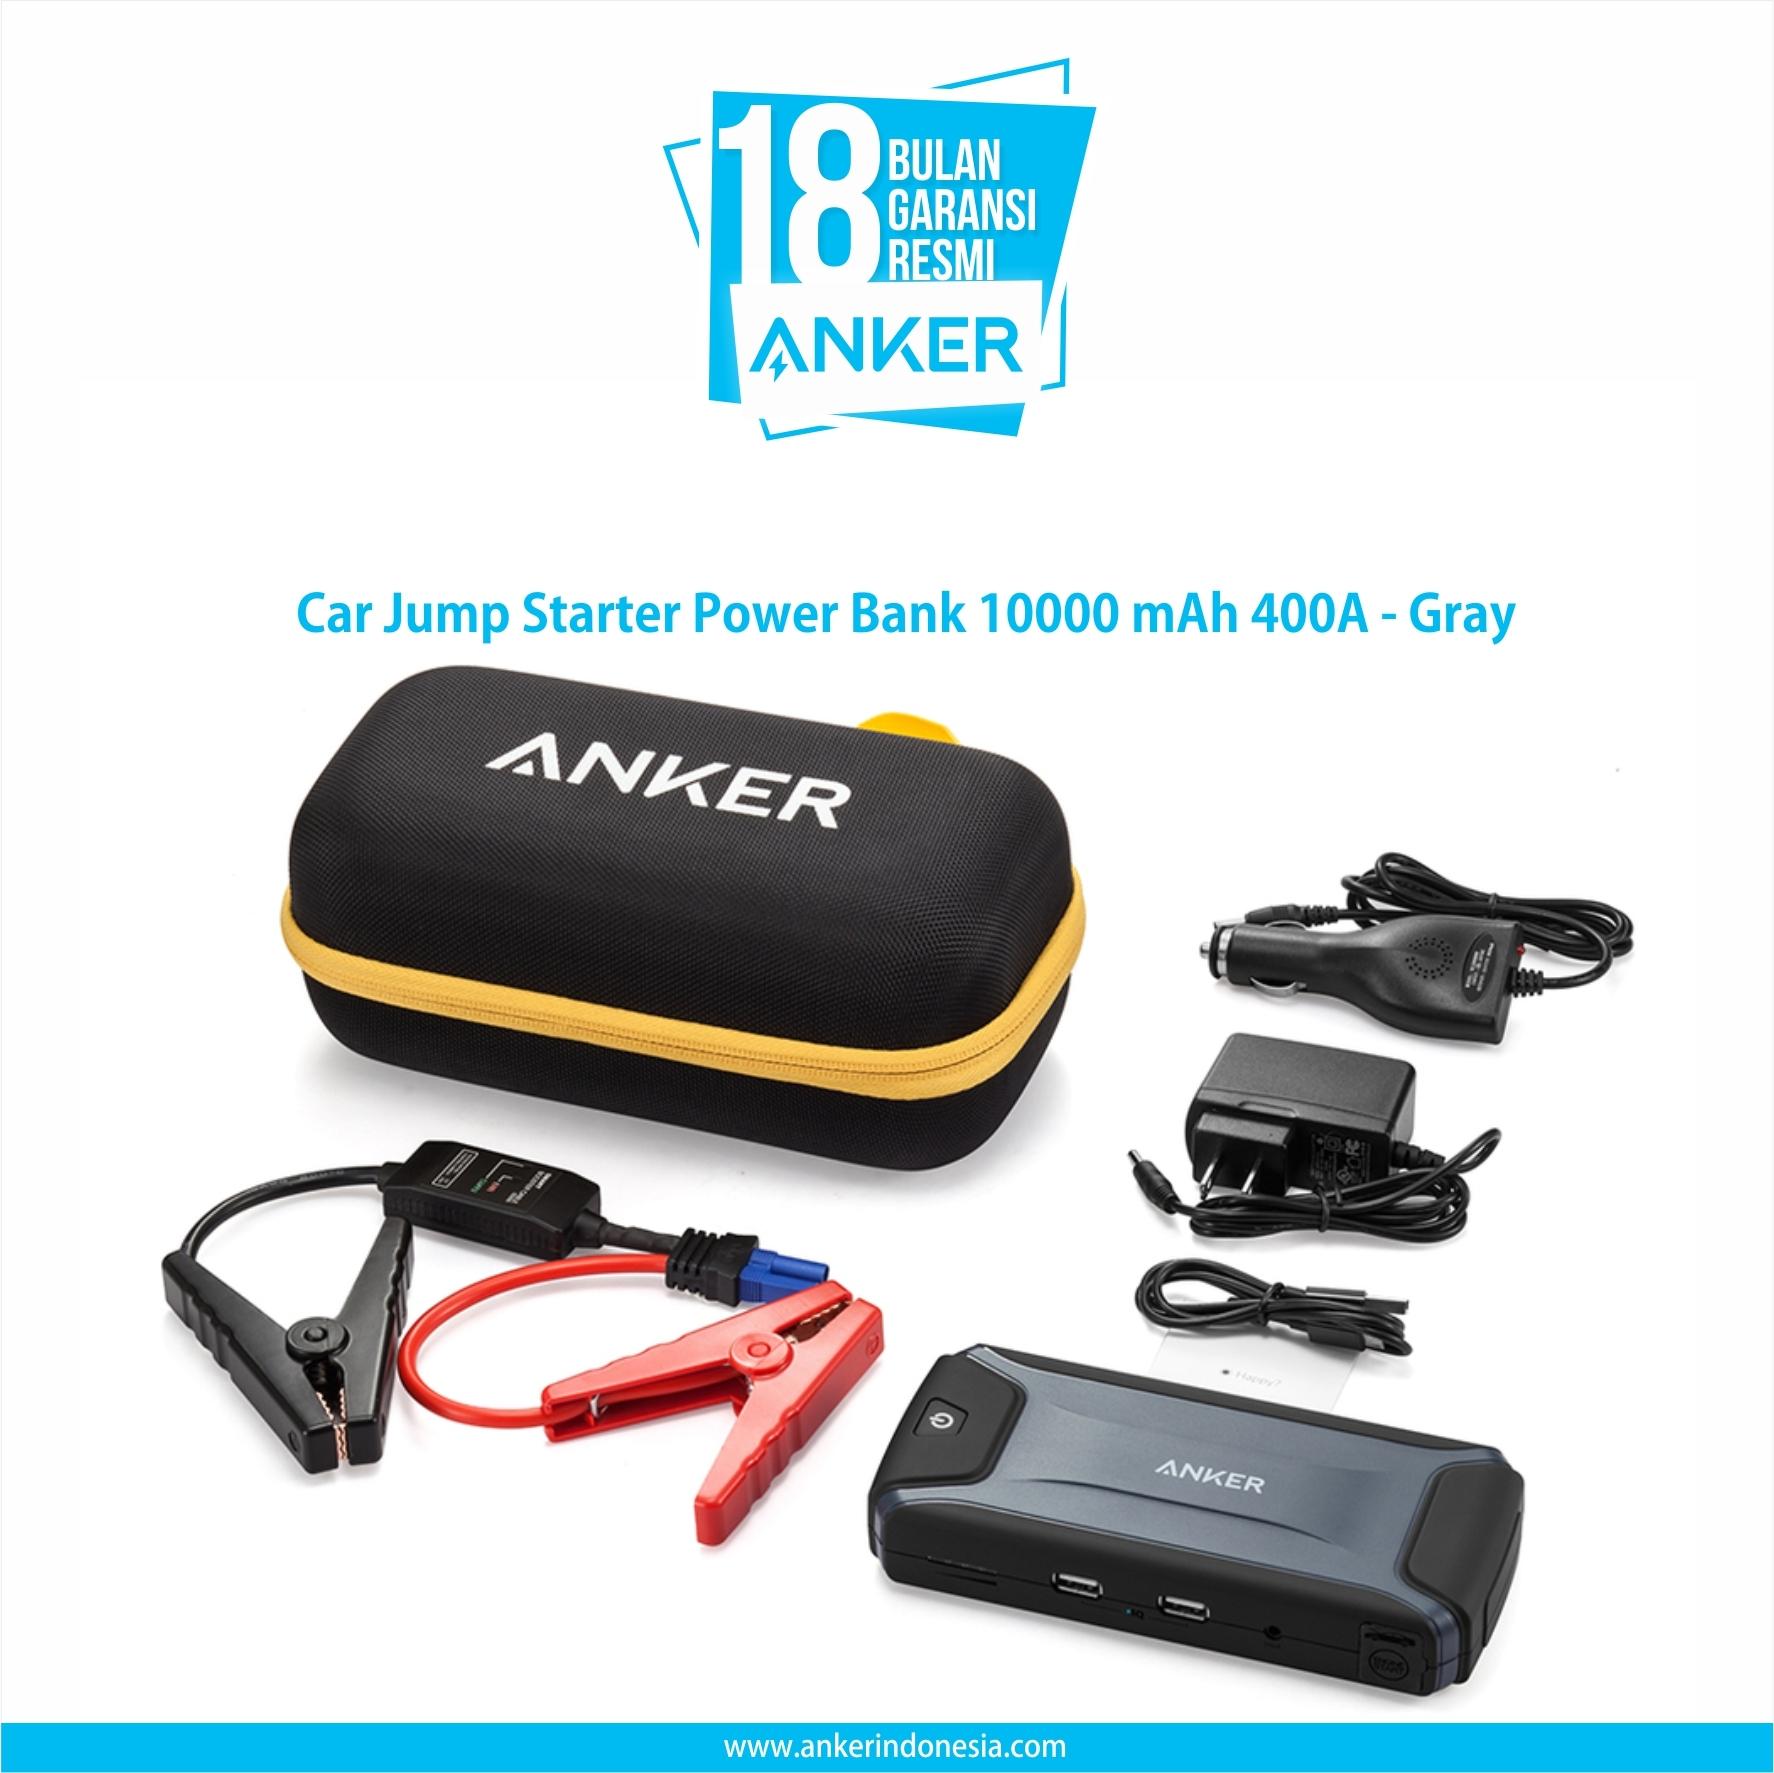 Anker Astro E3 10000mah Hitam Daftar Harga Terlengkap Indonesia Black Car Jump Starter Power Bank 37wh 400a Gray A1501211